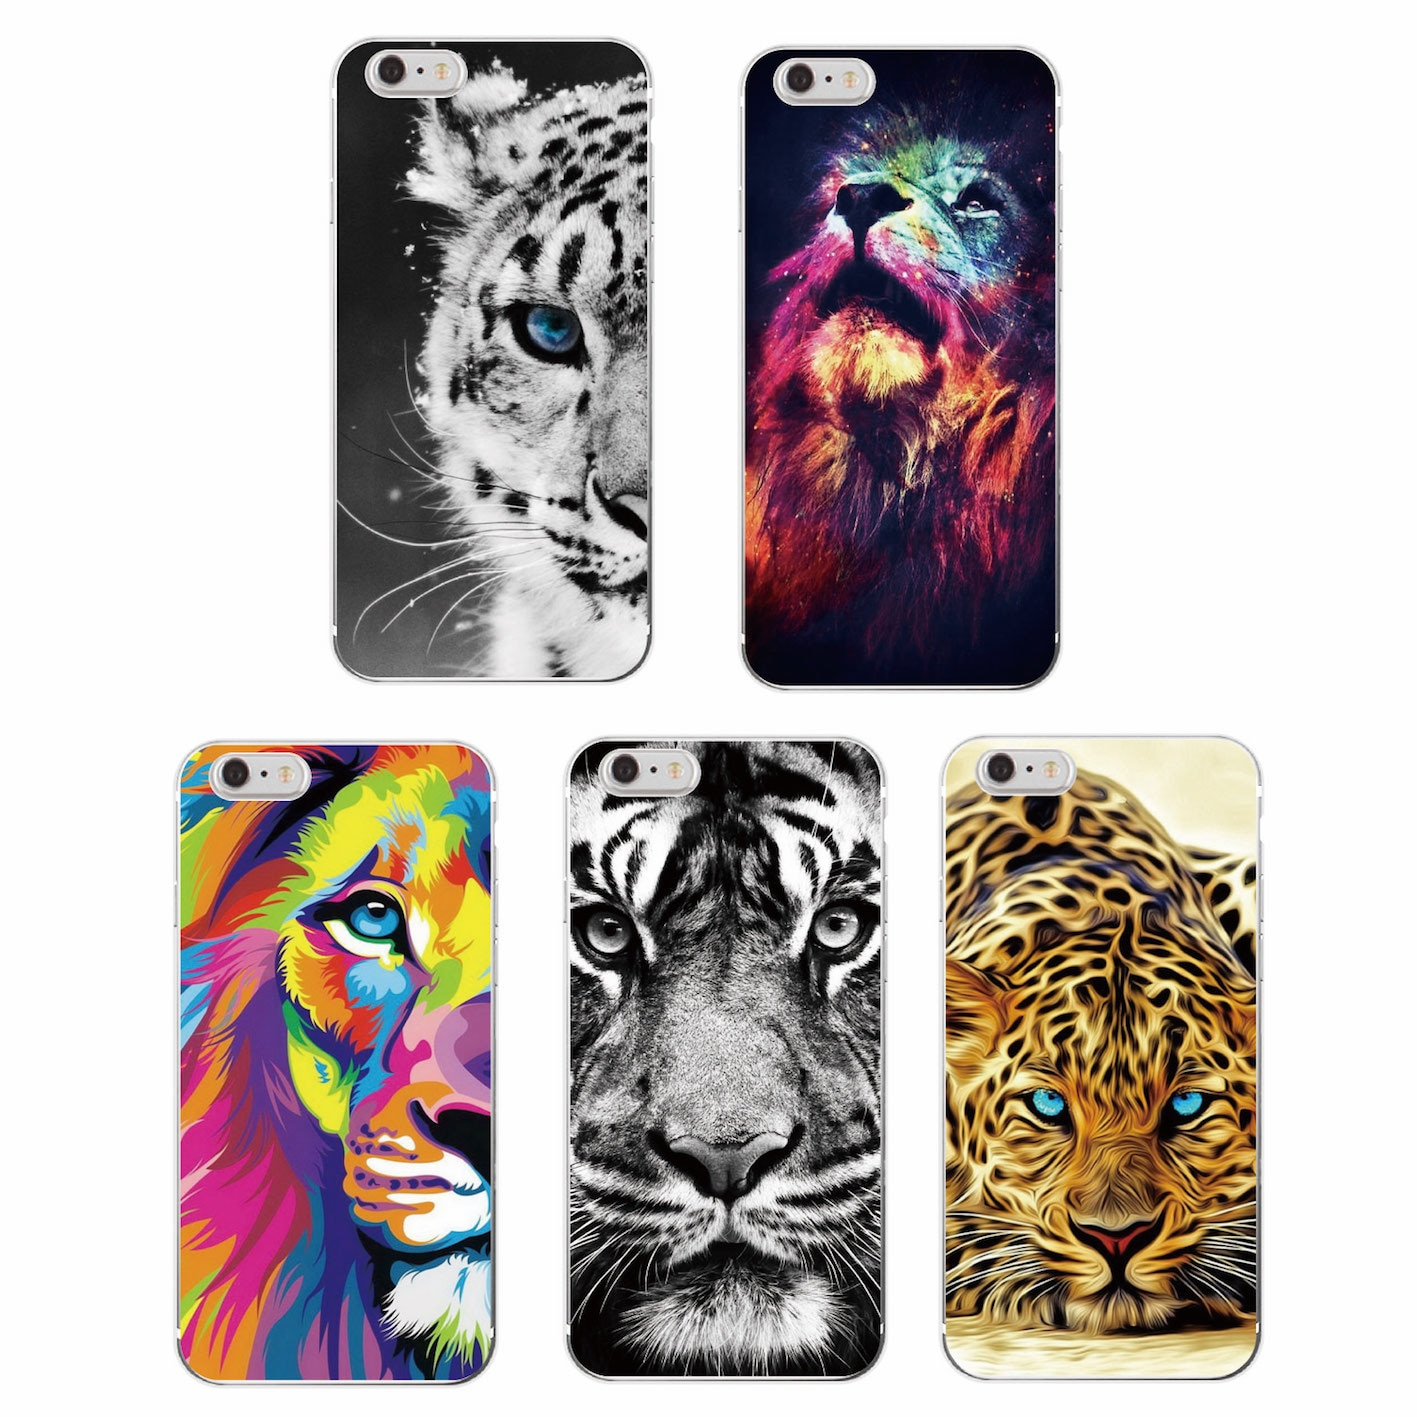 Модный мягкий чехол с рисунком льва, тигра, пантеры, леопарда, для iPhone 11, 7, 7 Plus, 6, 6 S, 5S, 8, 8 Plus, X, XS Max, SAMSUNG GALSXY, S8, S8P